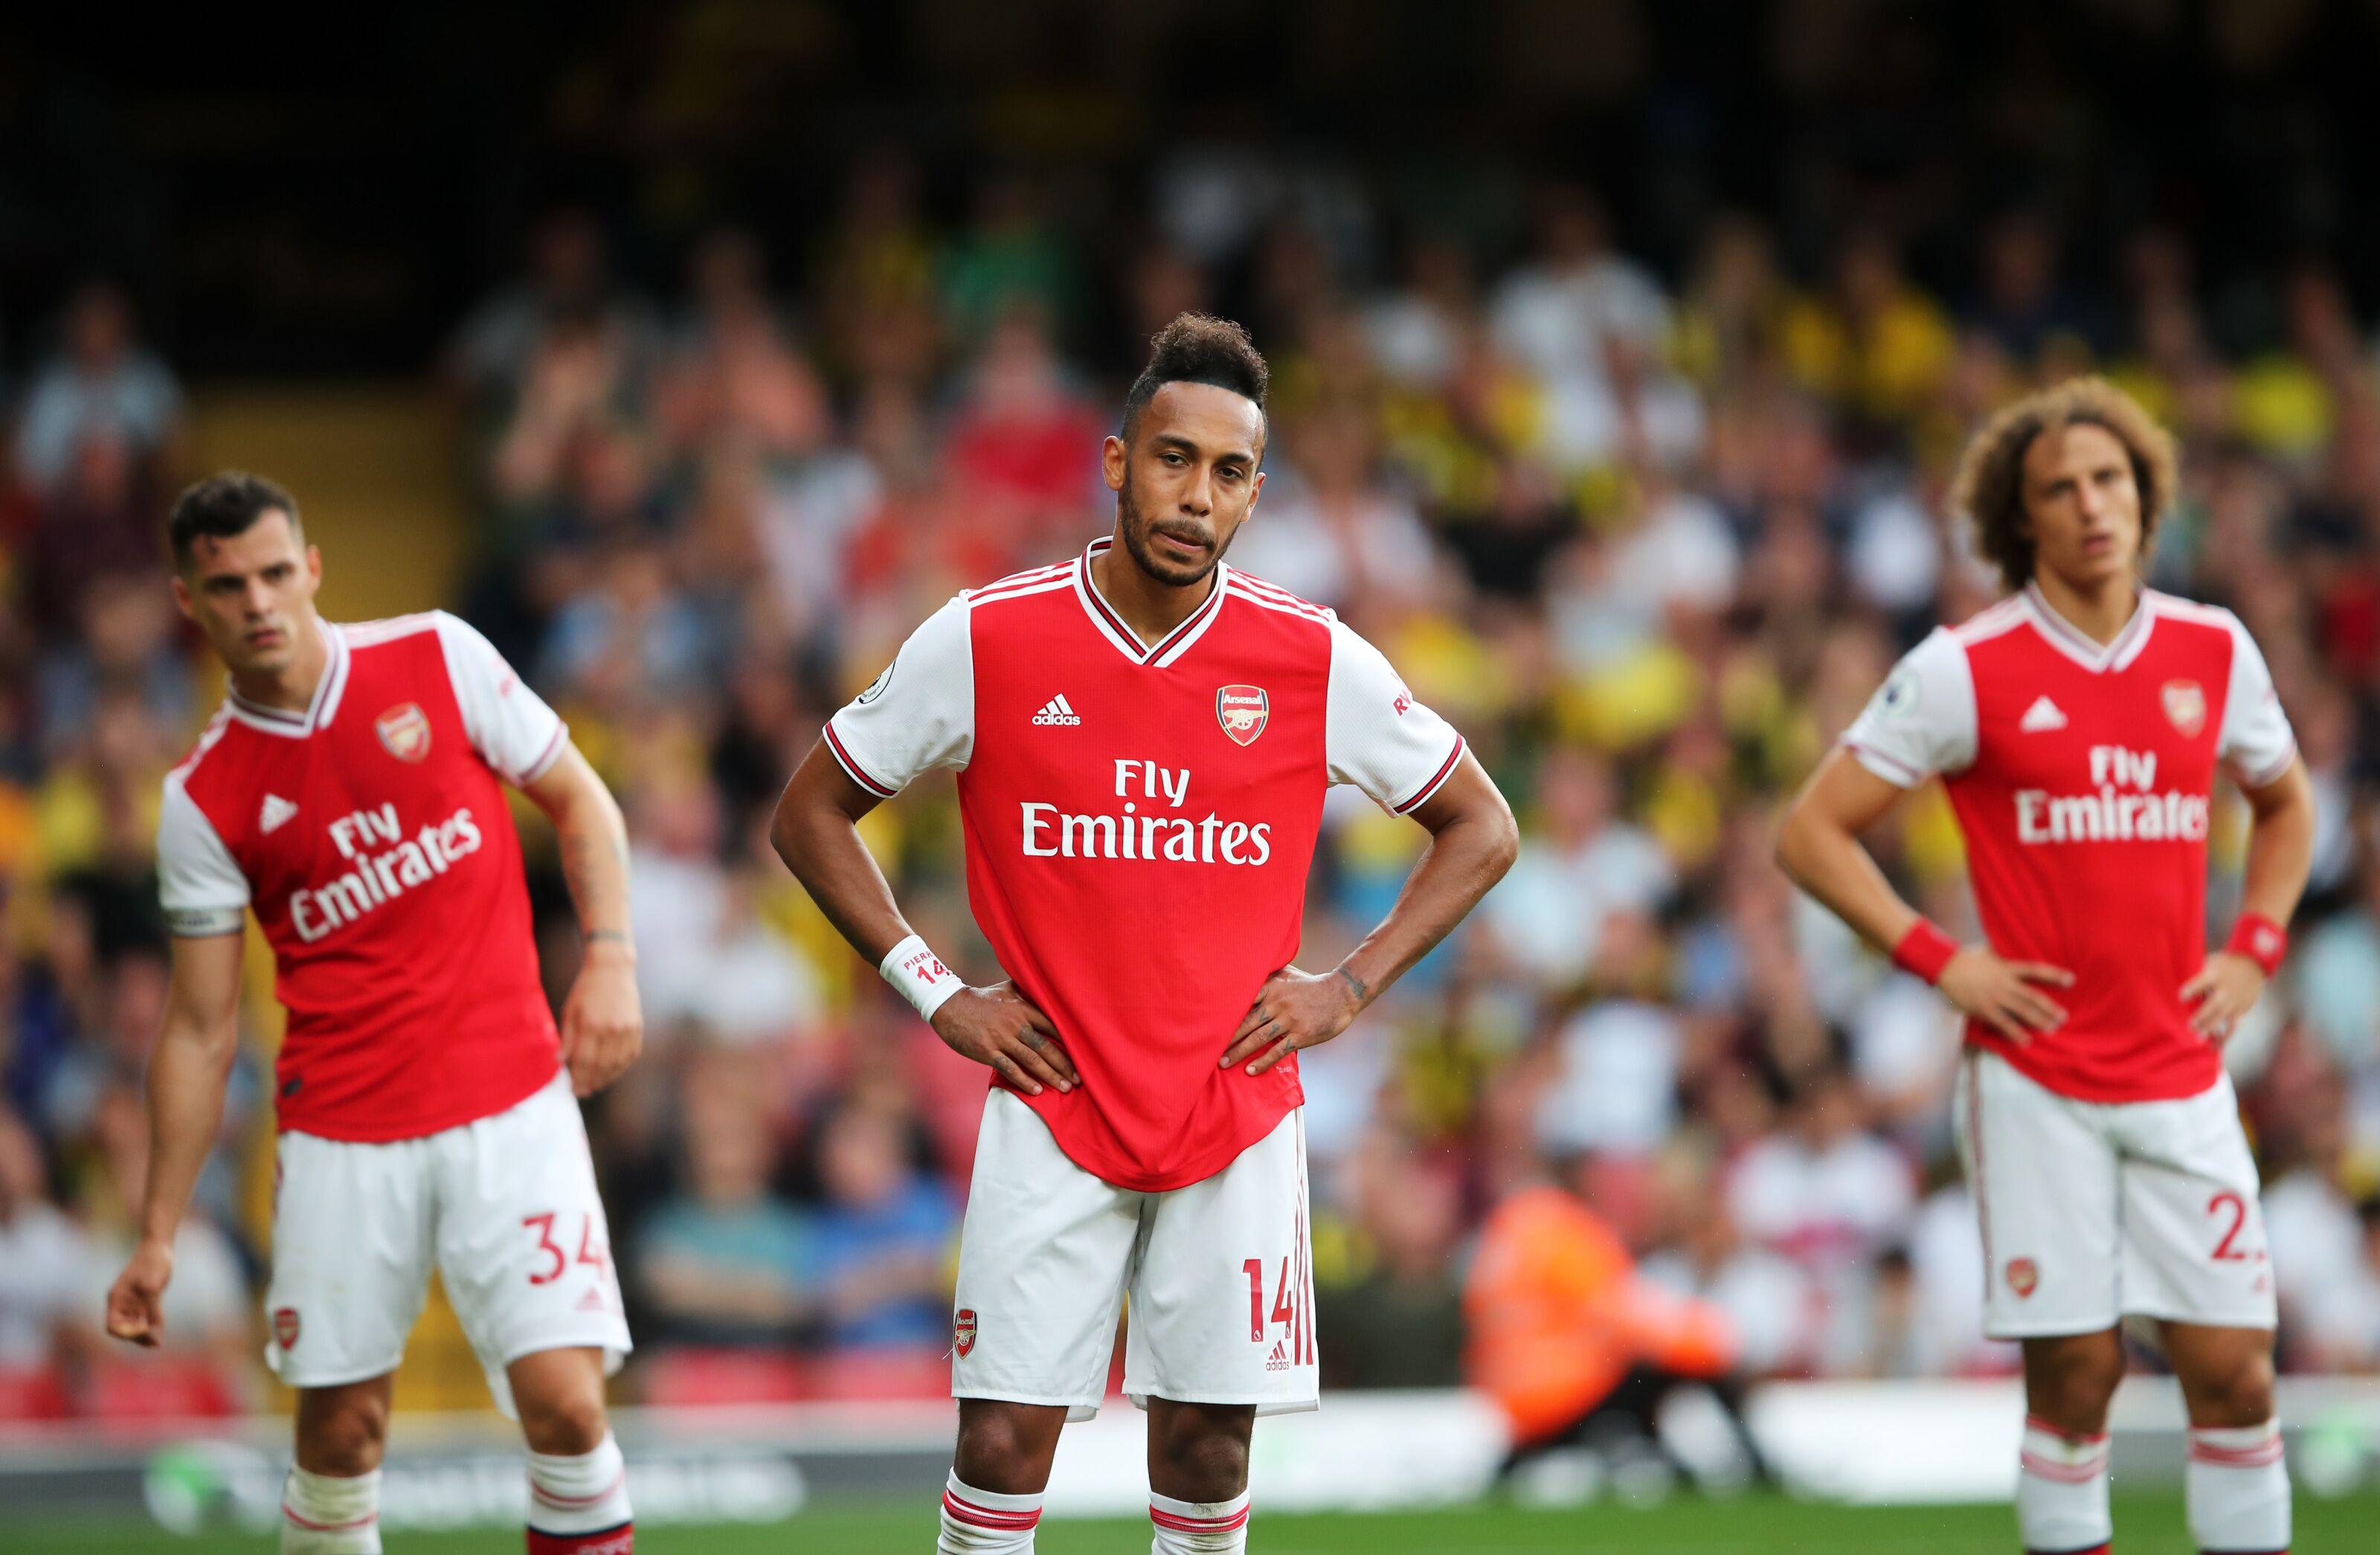 Arsenal: Pierre-Emerick Aubameyang drama another sparkling turd